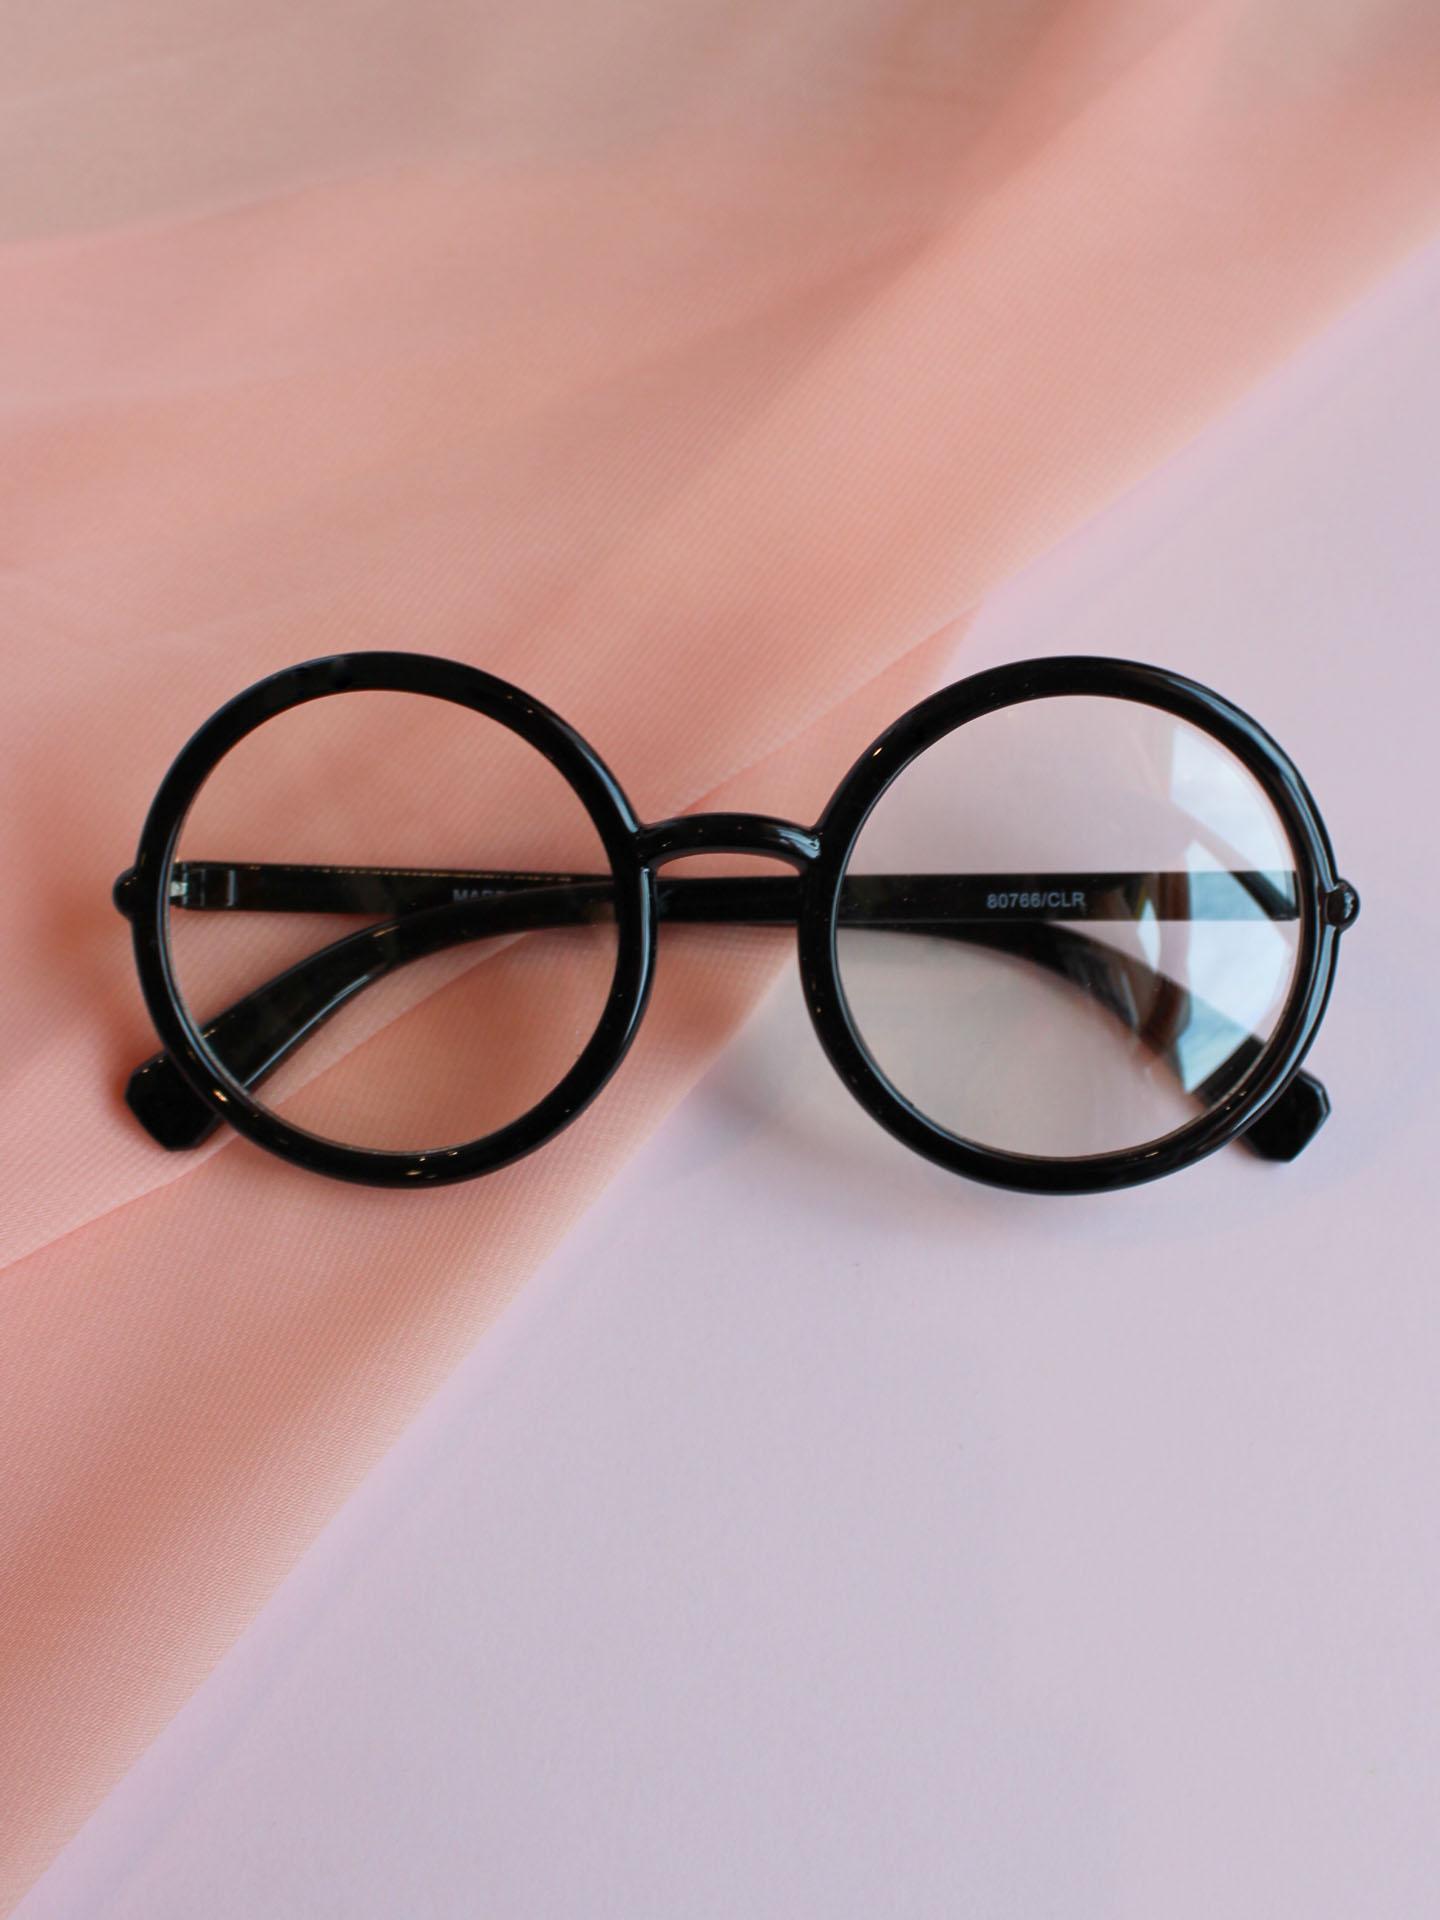 Cyrus Glasses Black Circle Clear Lenses